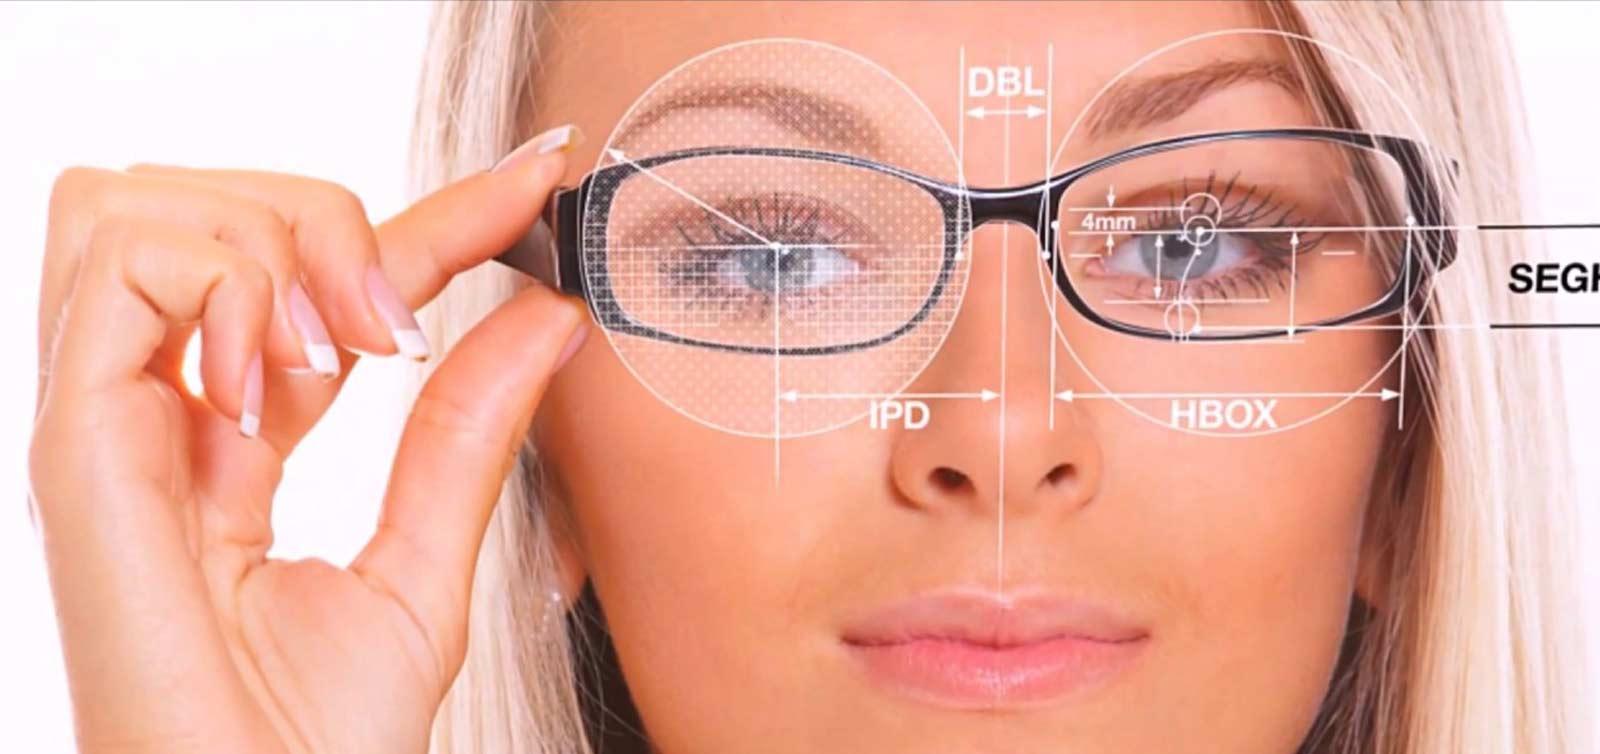 ee074a4c41 Πολυεστιακά γυαλιά Tokai τιμές Προσφοράς - Eye-Shop